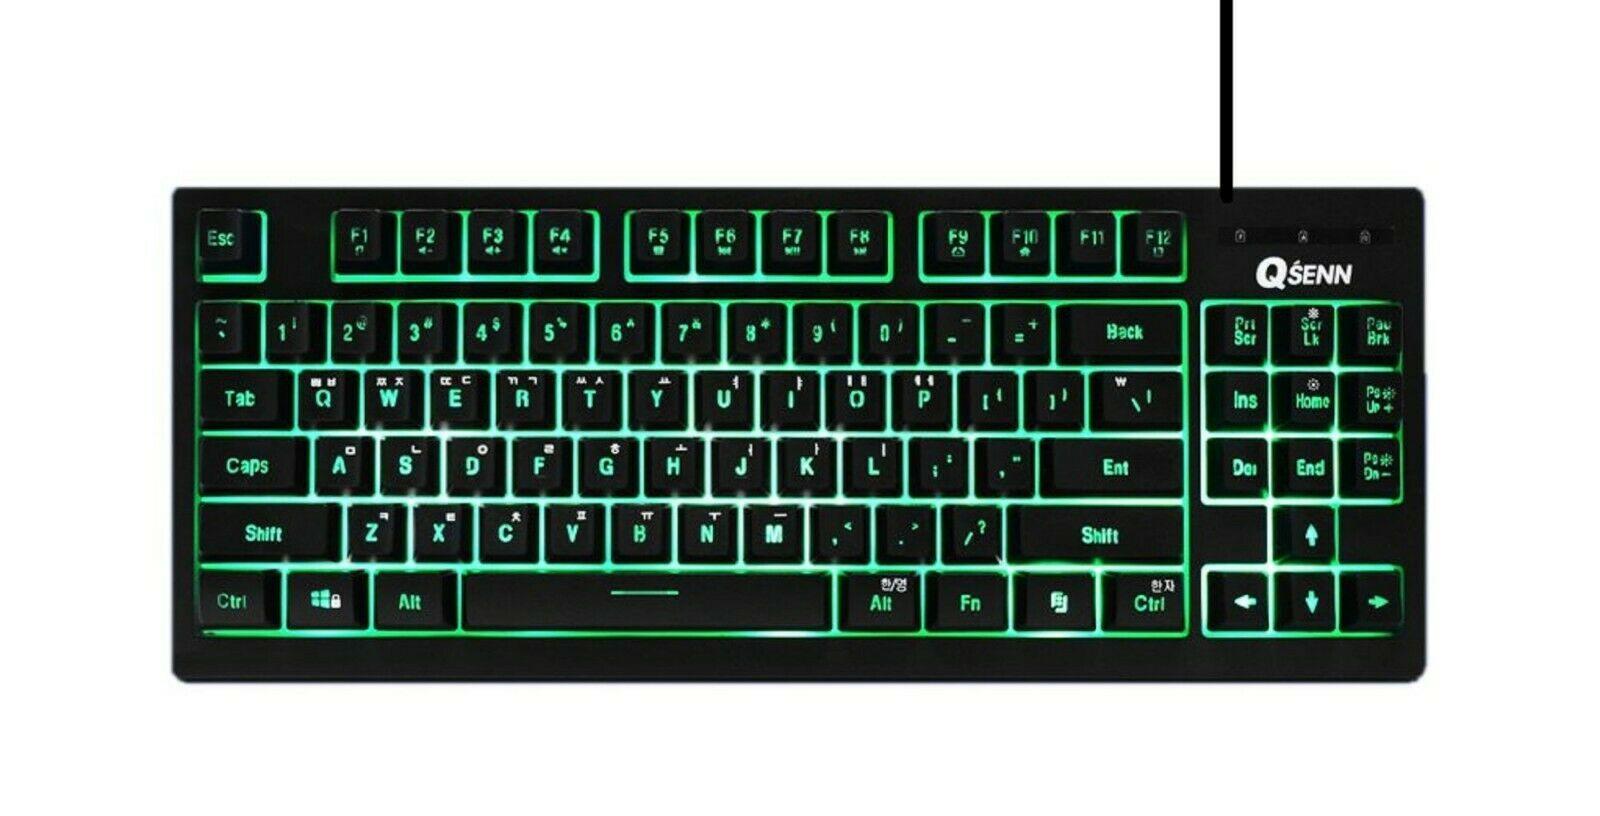 QSENN SEM-DT25T Korean English Gaming Tenkeyless Keyboard USB Wired Compact